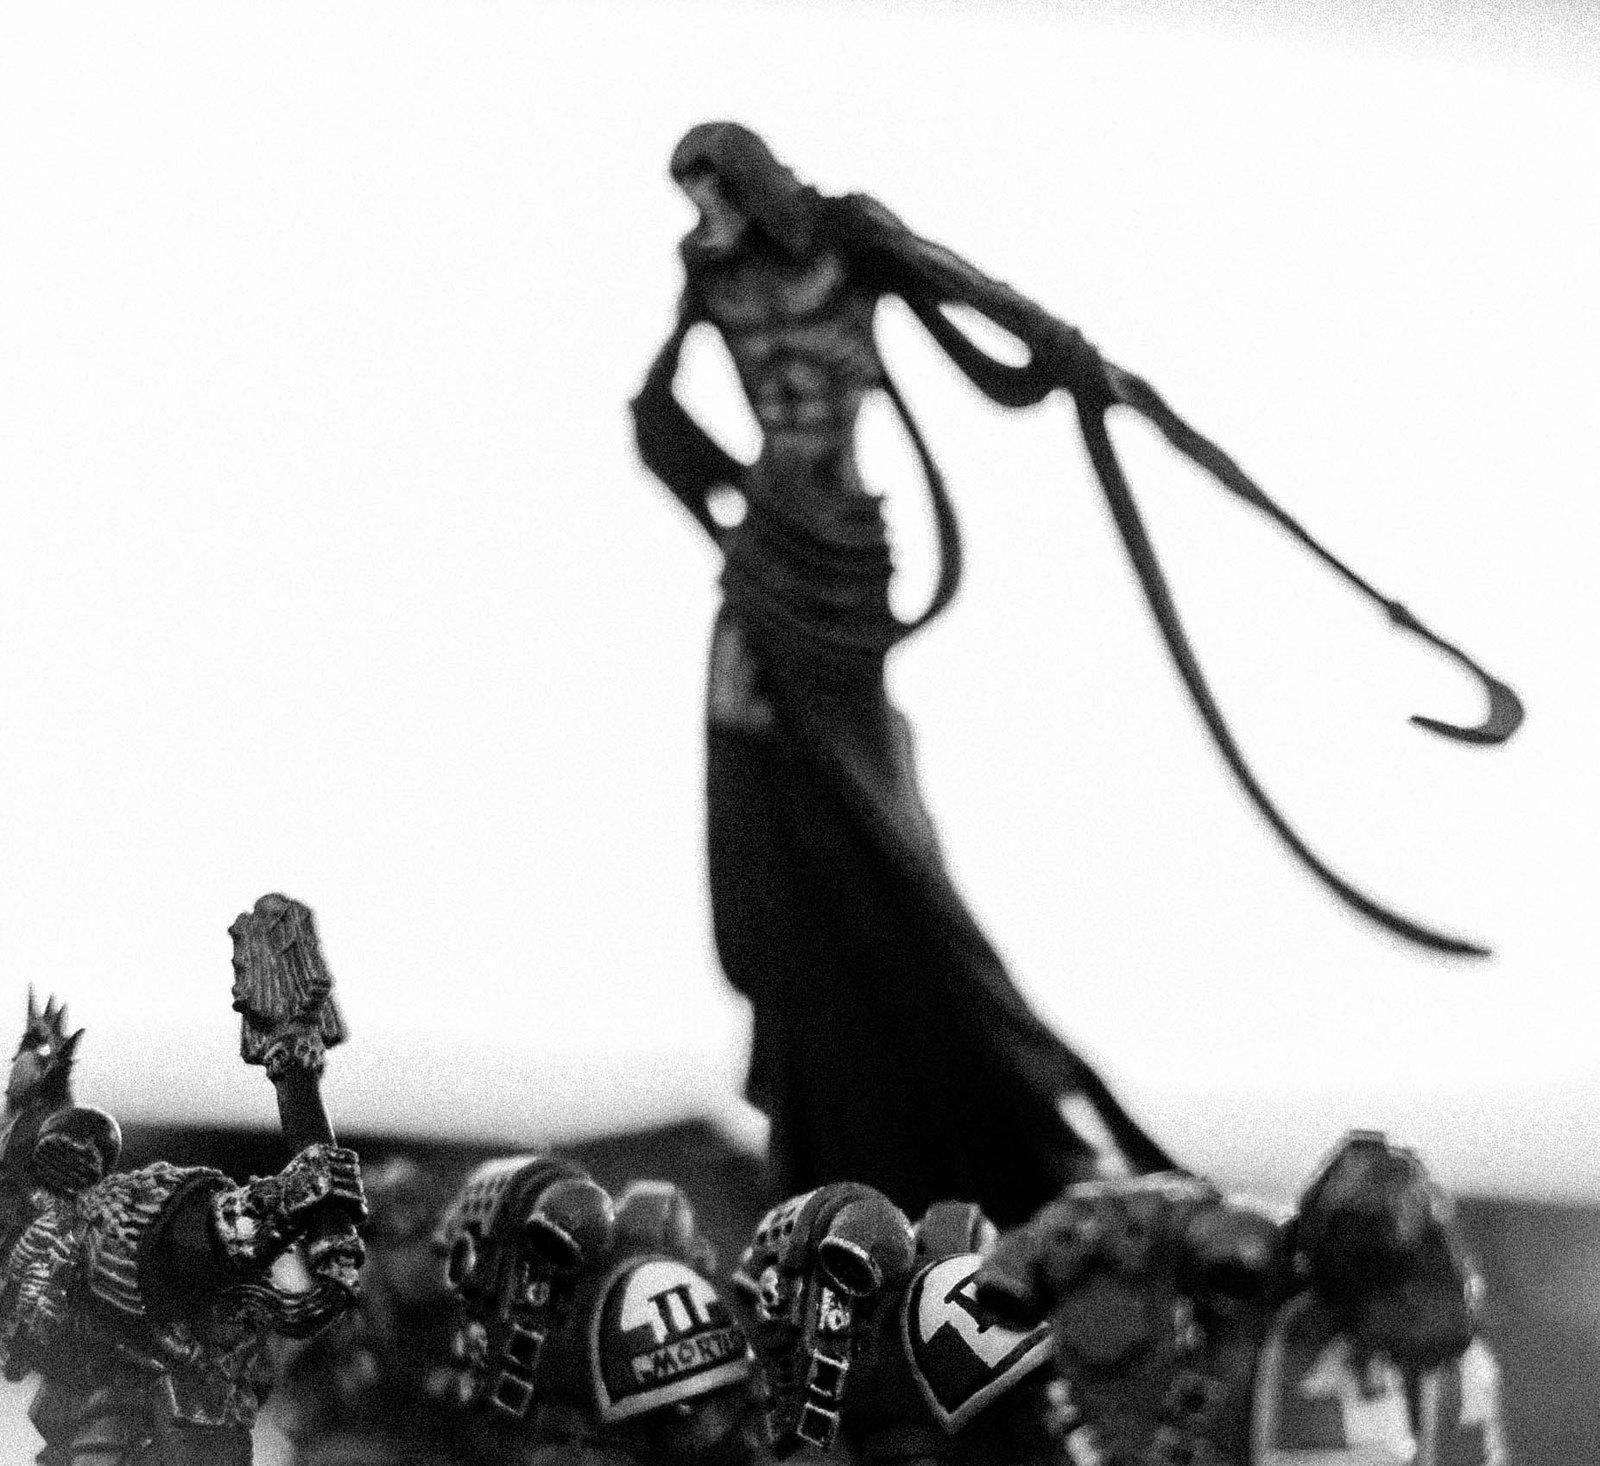 a778bf8ab6fde reddit-top-2.5-million/Warhammer40k.csv at master ·  umbrae/reddit-top-2.5-million · GitHub